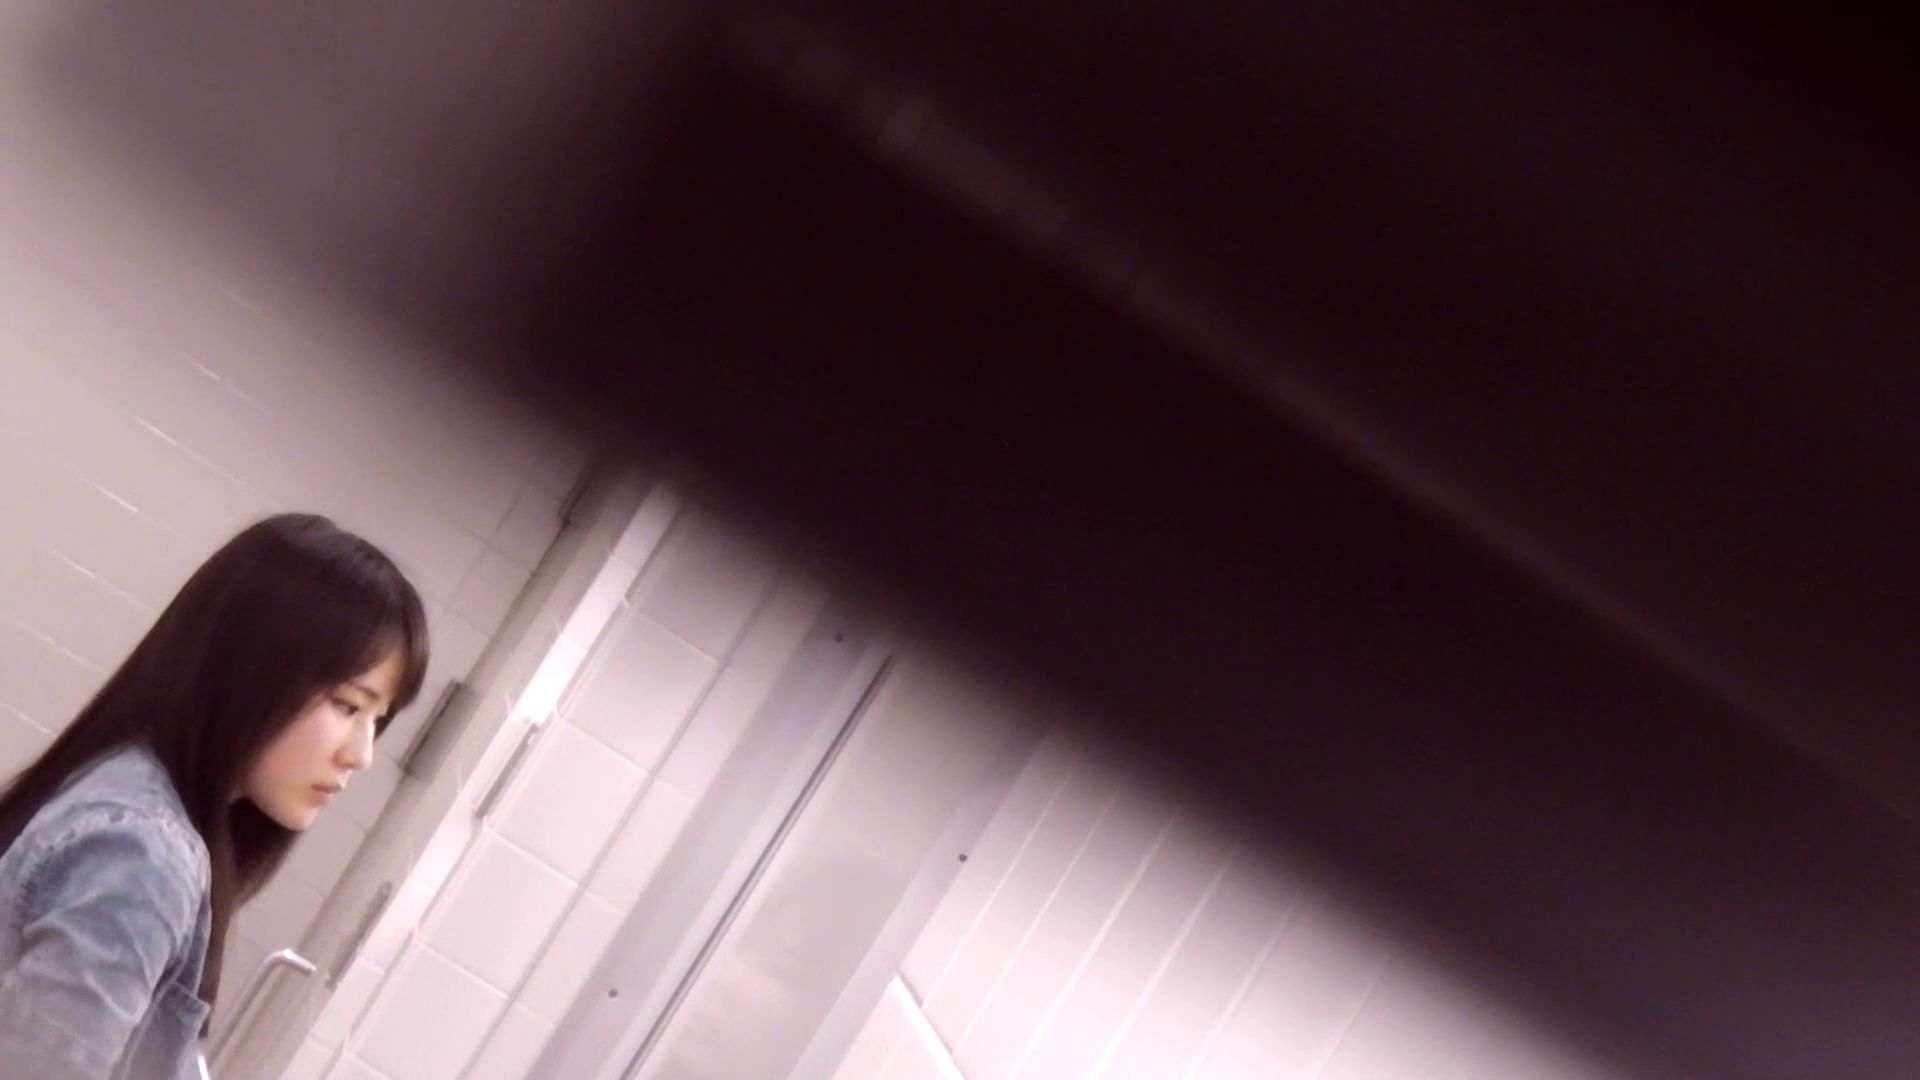 vol.13 命がけ潜伏洗面所! 大丈夫ですか?はまりそうです。 洗面所突入 おまんこ無修正動画無料 100pic 14